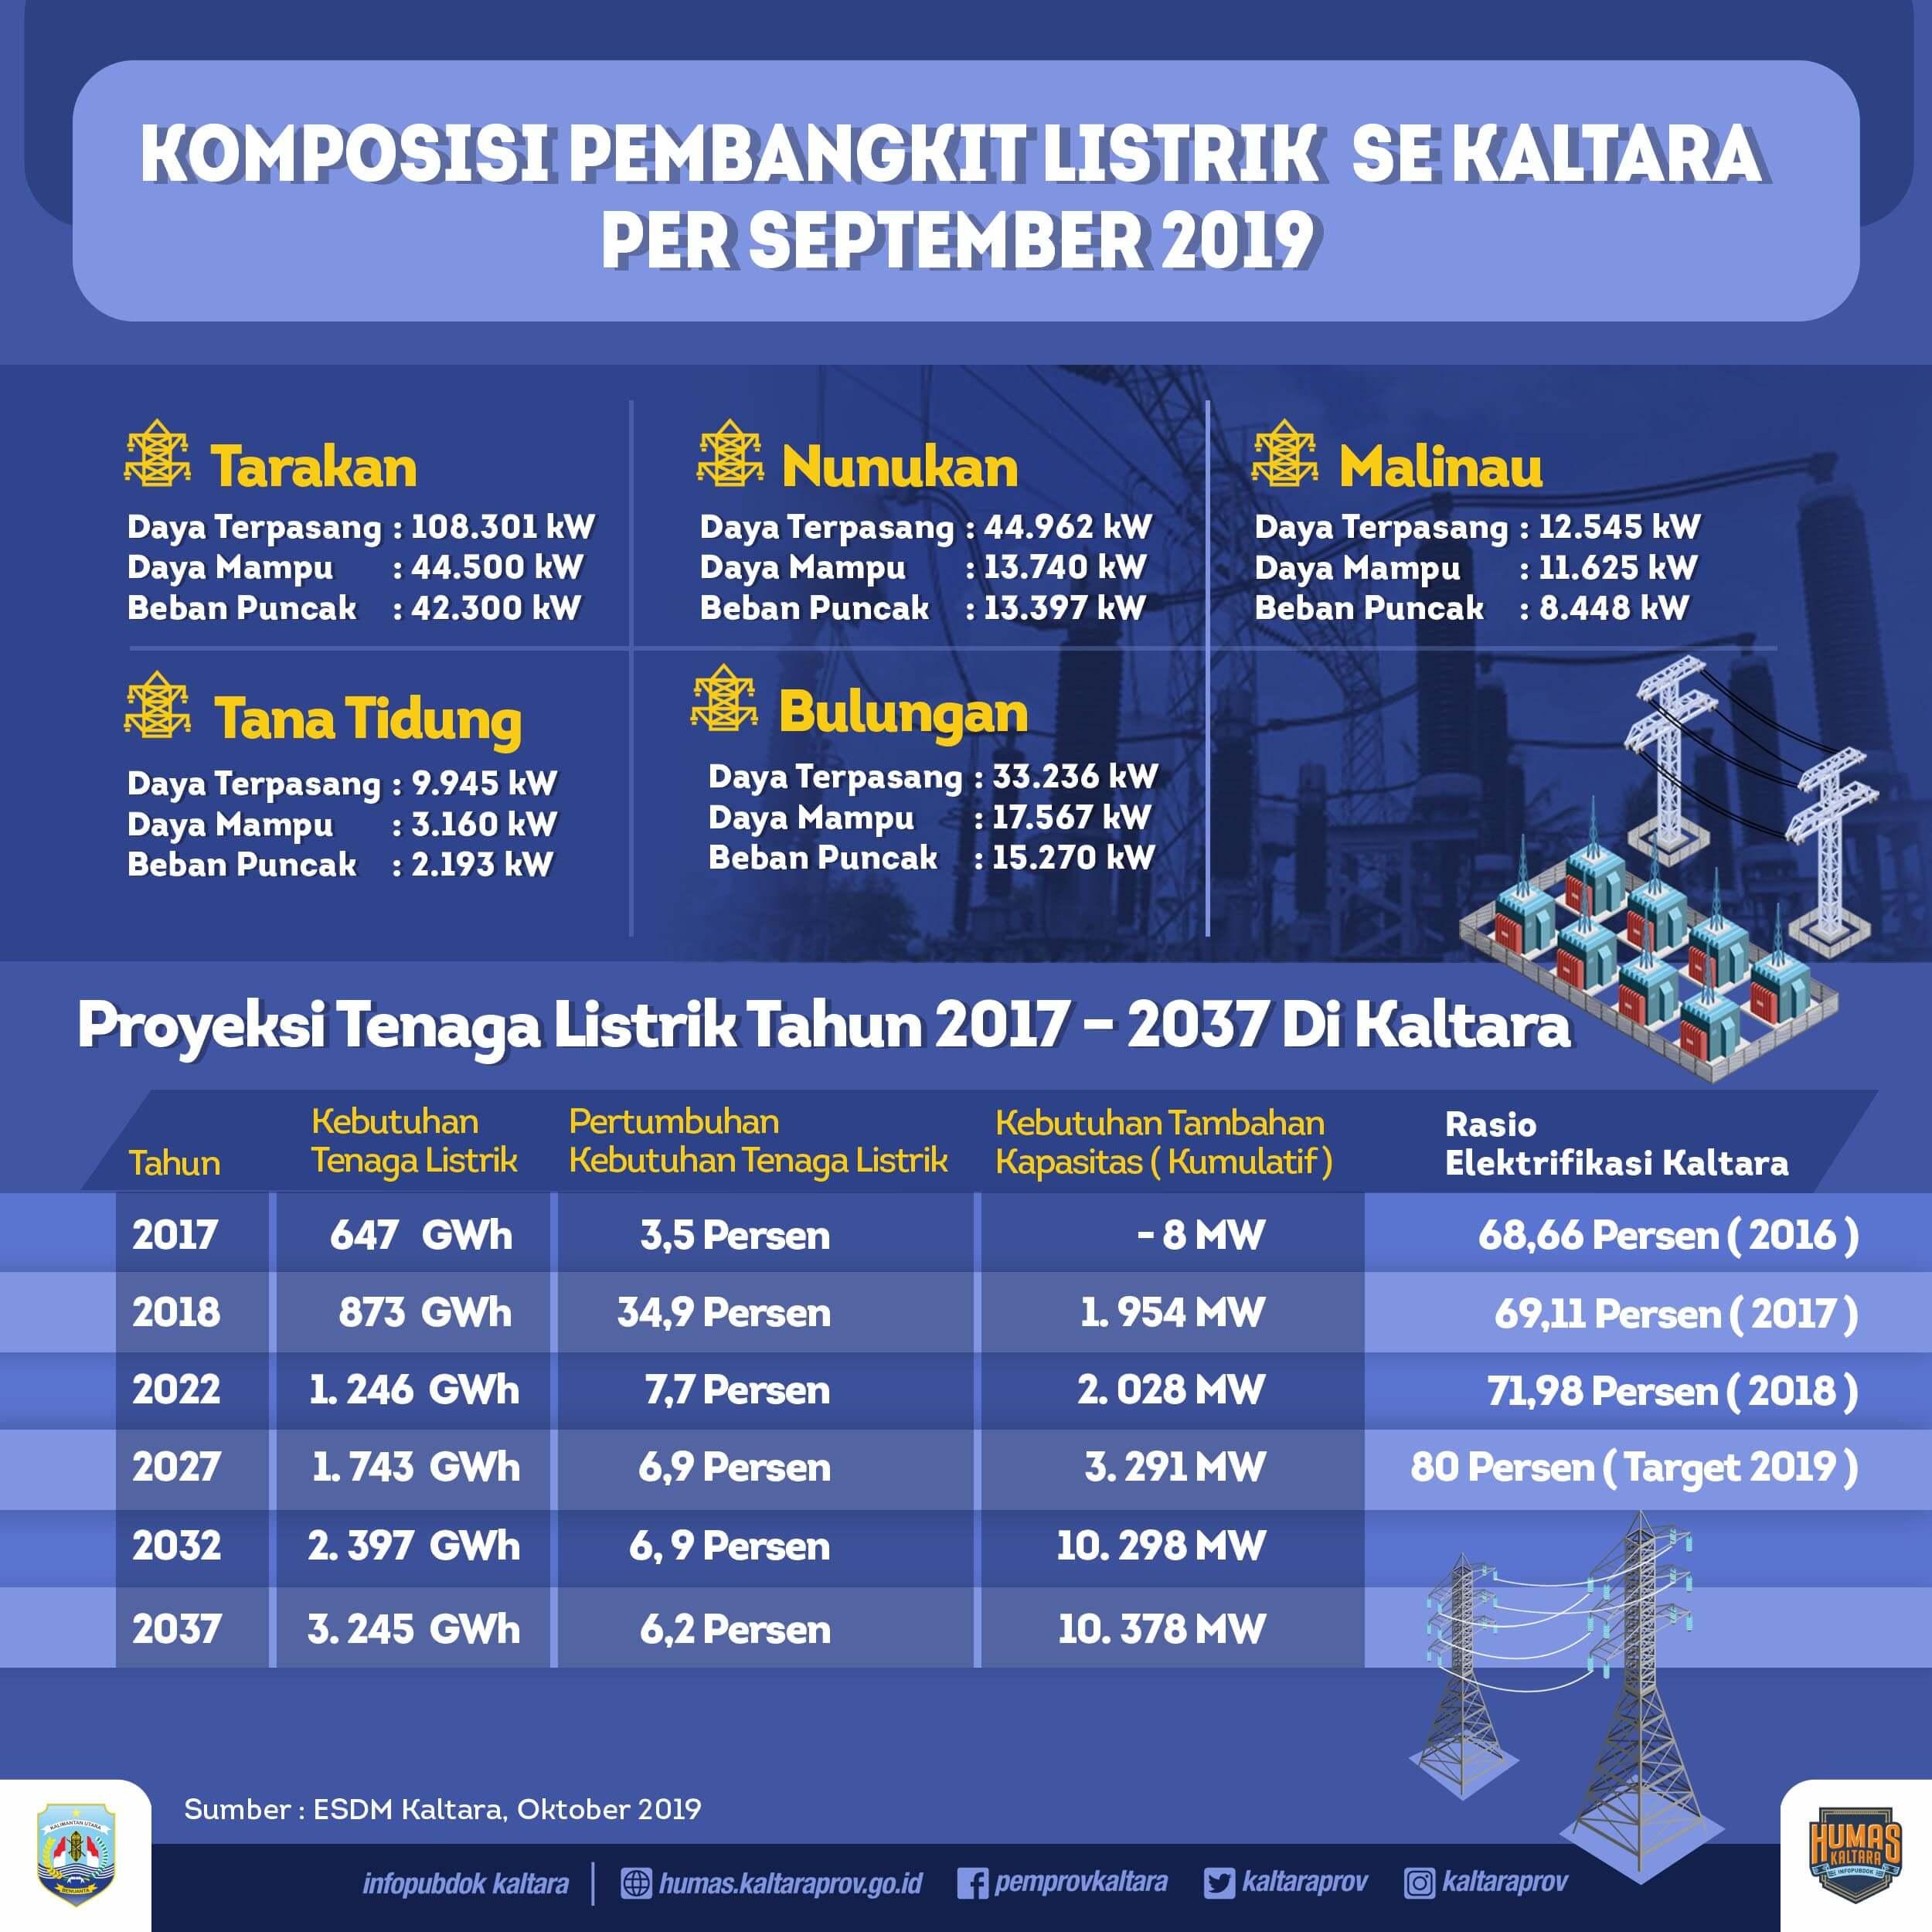 2020 Provinsi Kaltara, Targetkan Rasio Elektrifikasi Capai 99,9 Persen